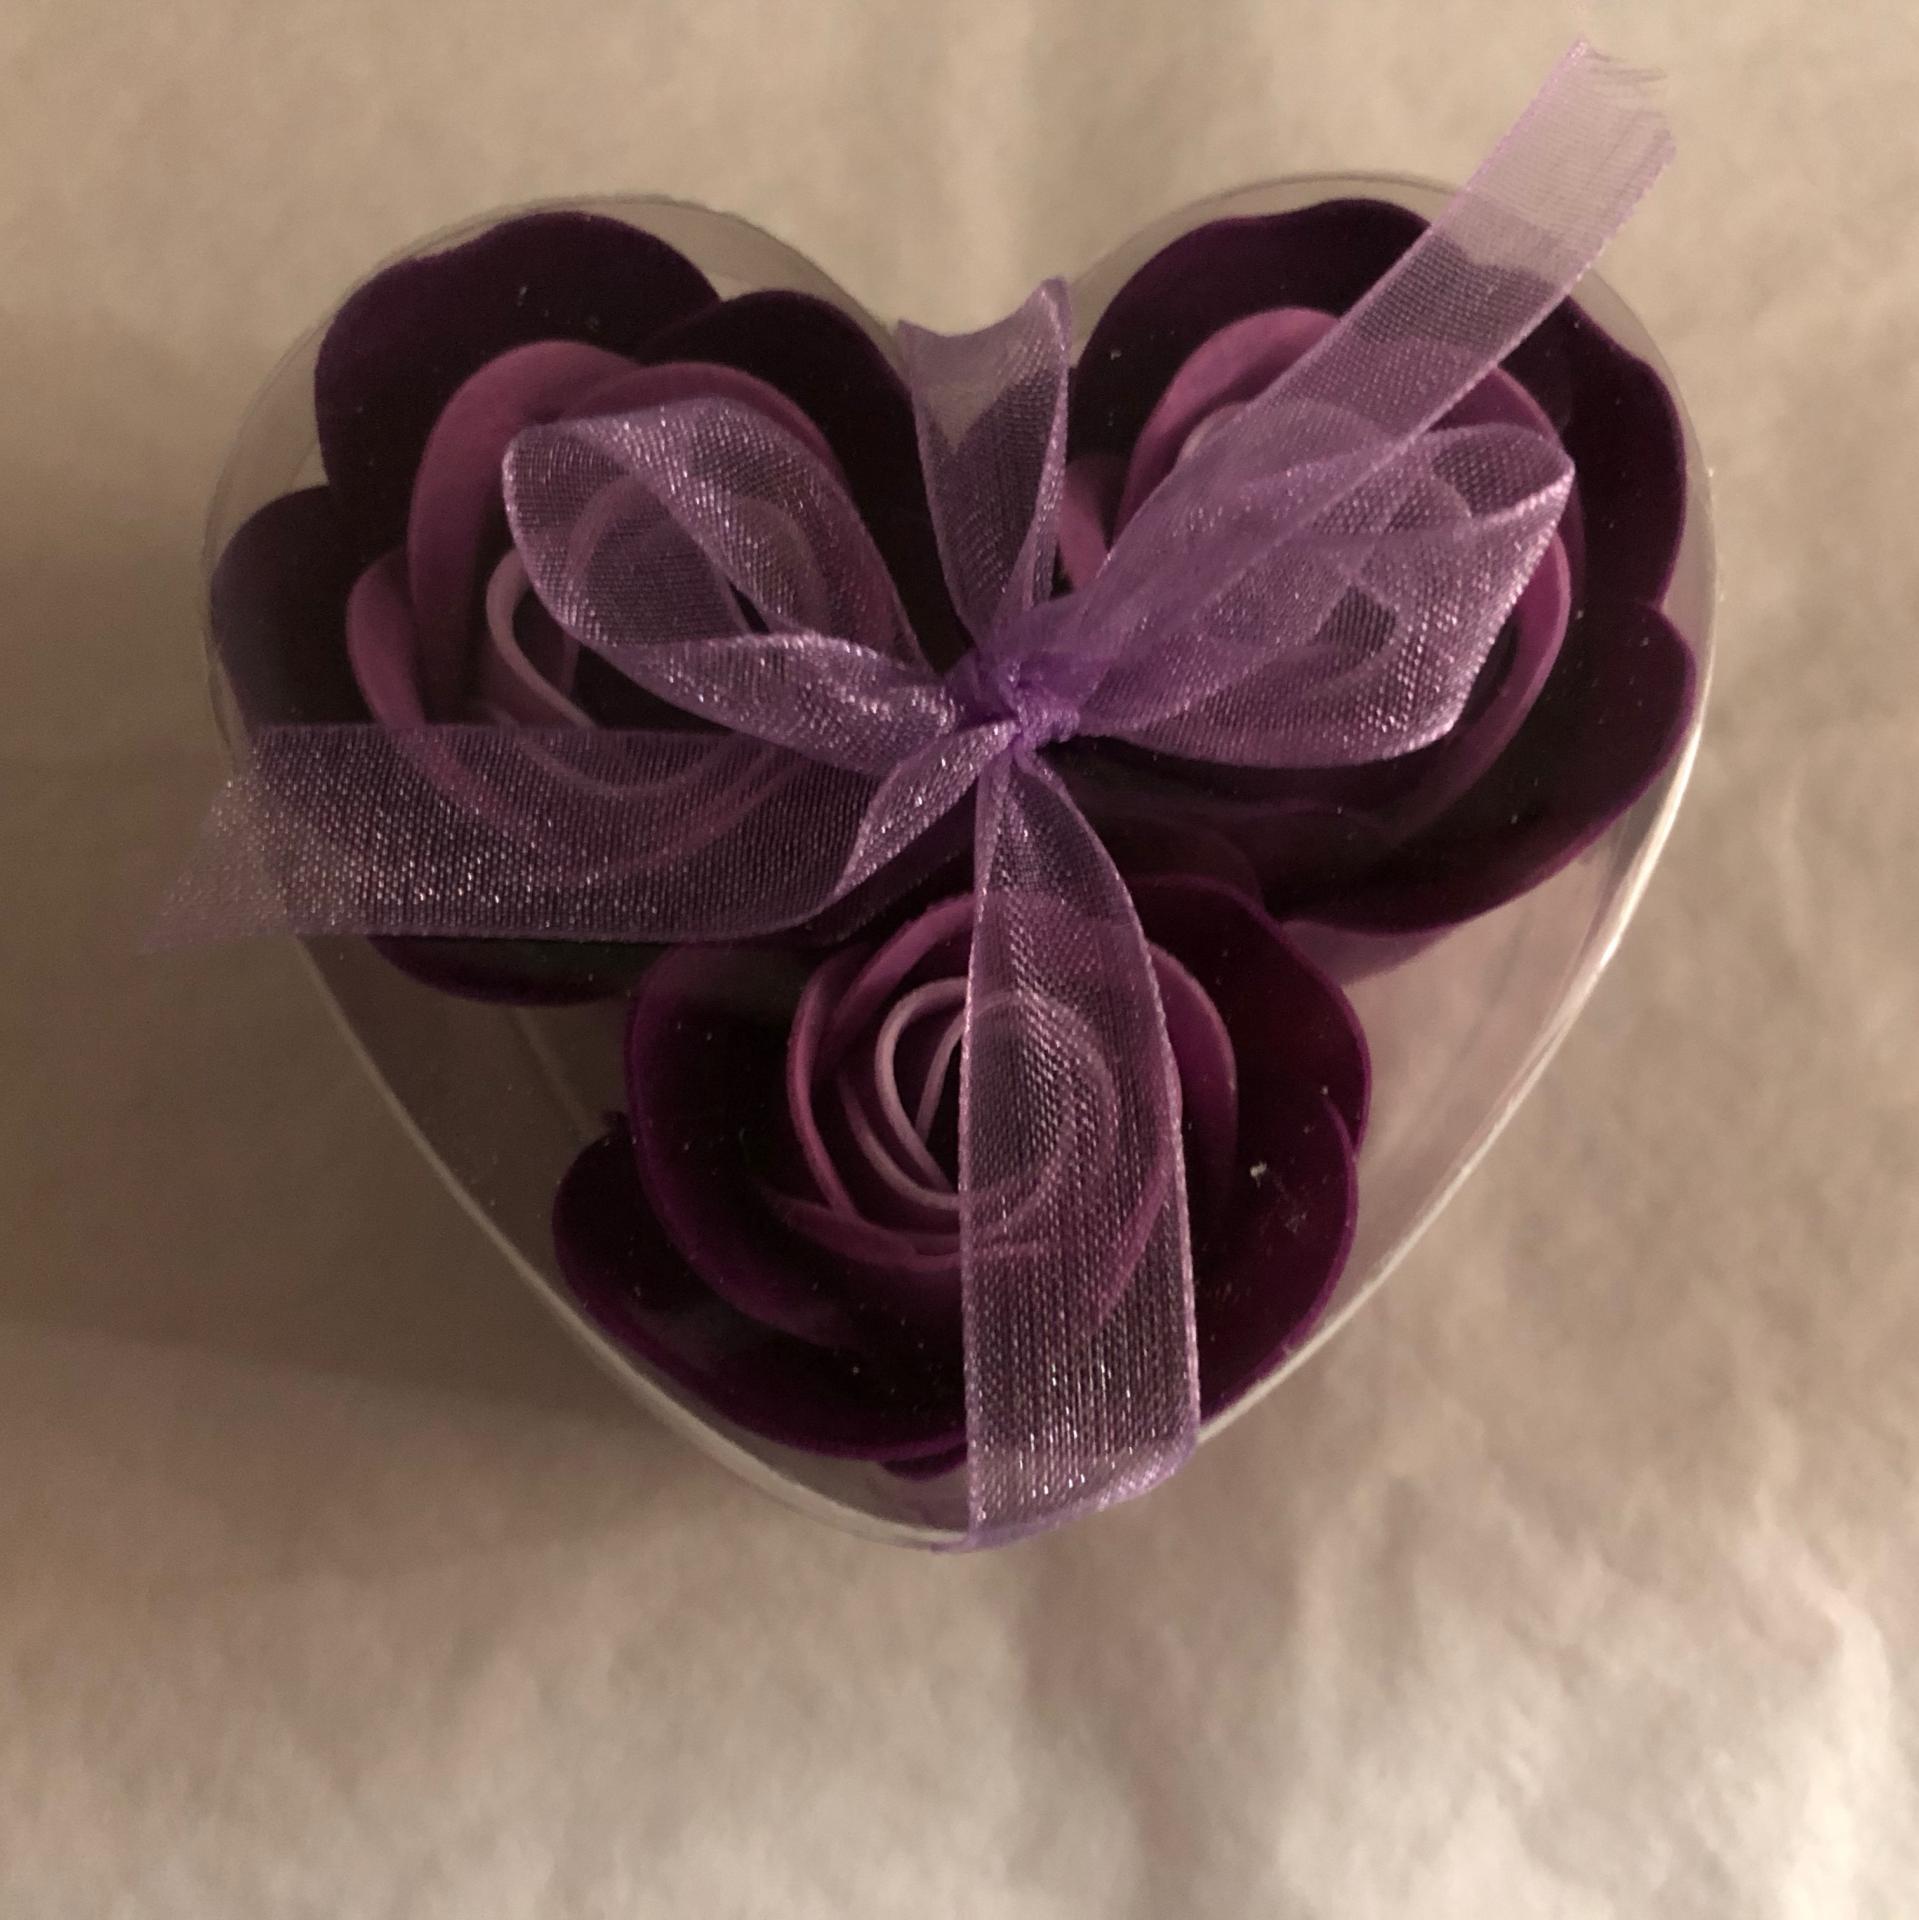 Boutons de rose x3 violet